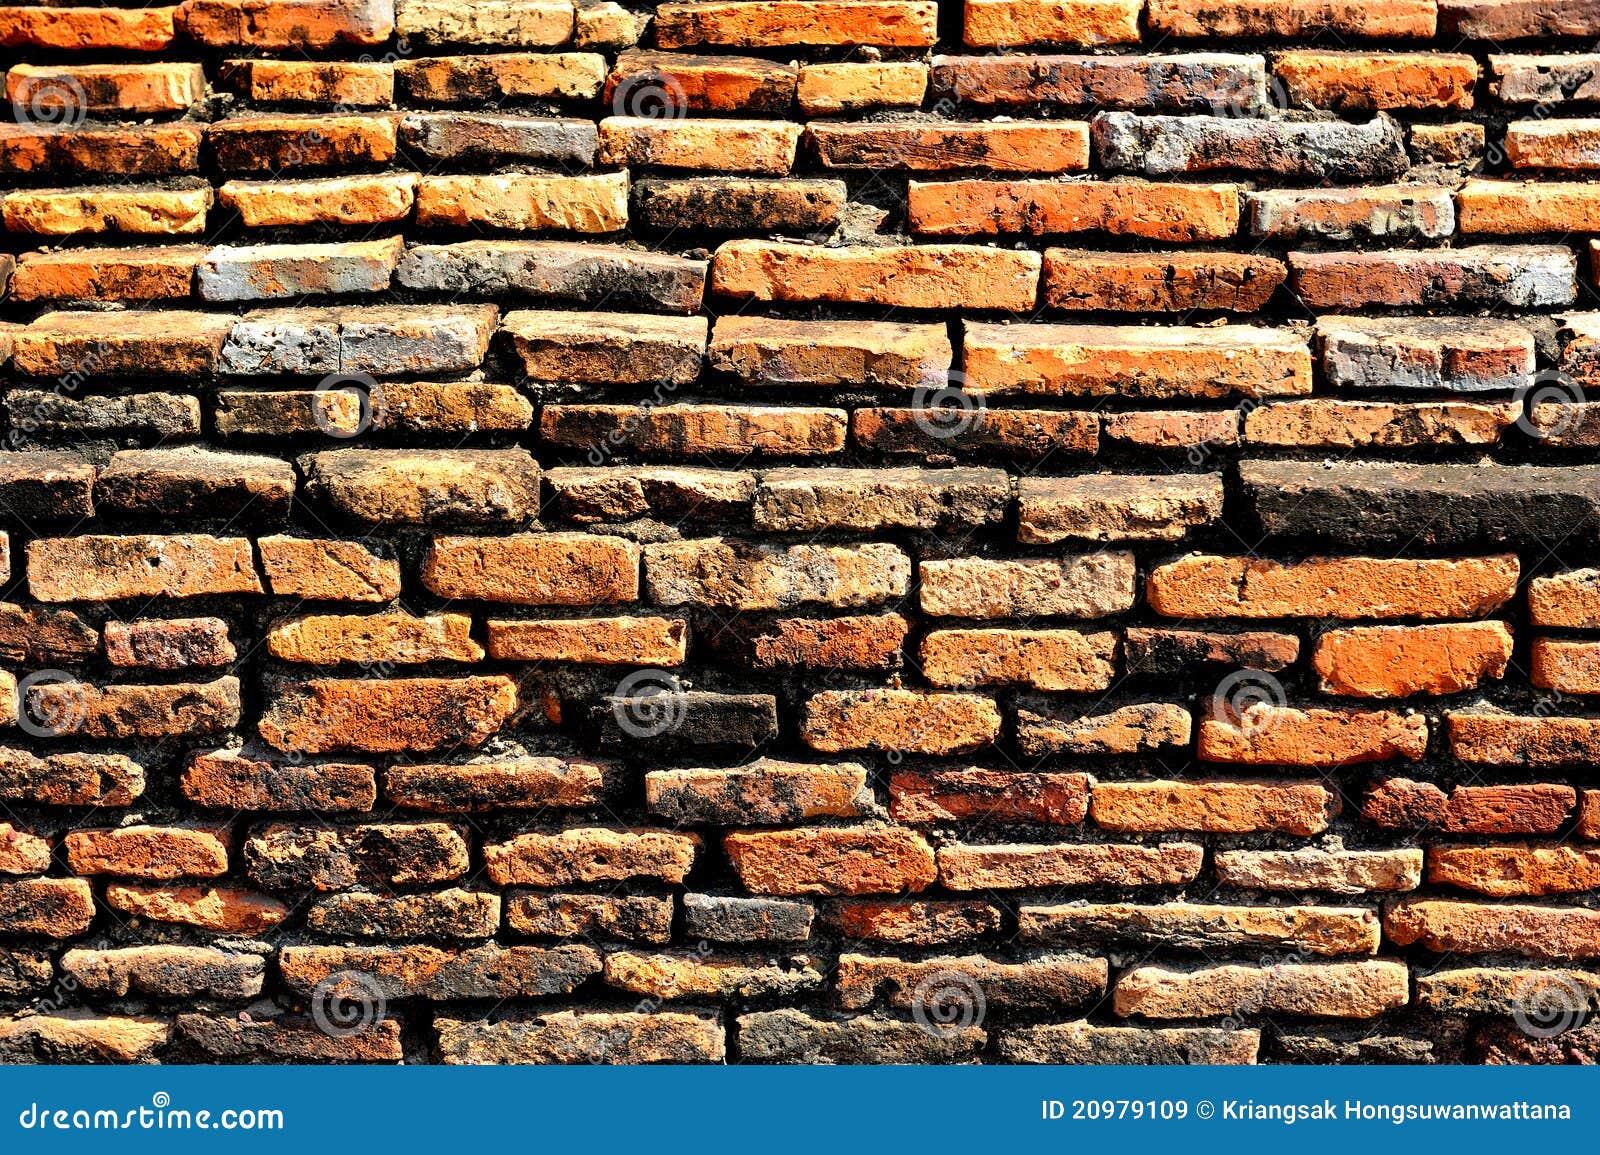 Brick Block Wallpaper Stock Image Image Of Background